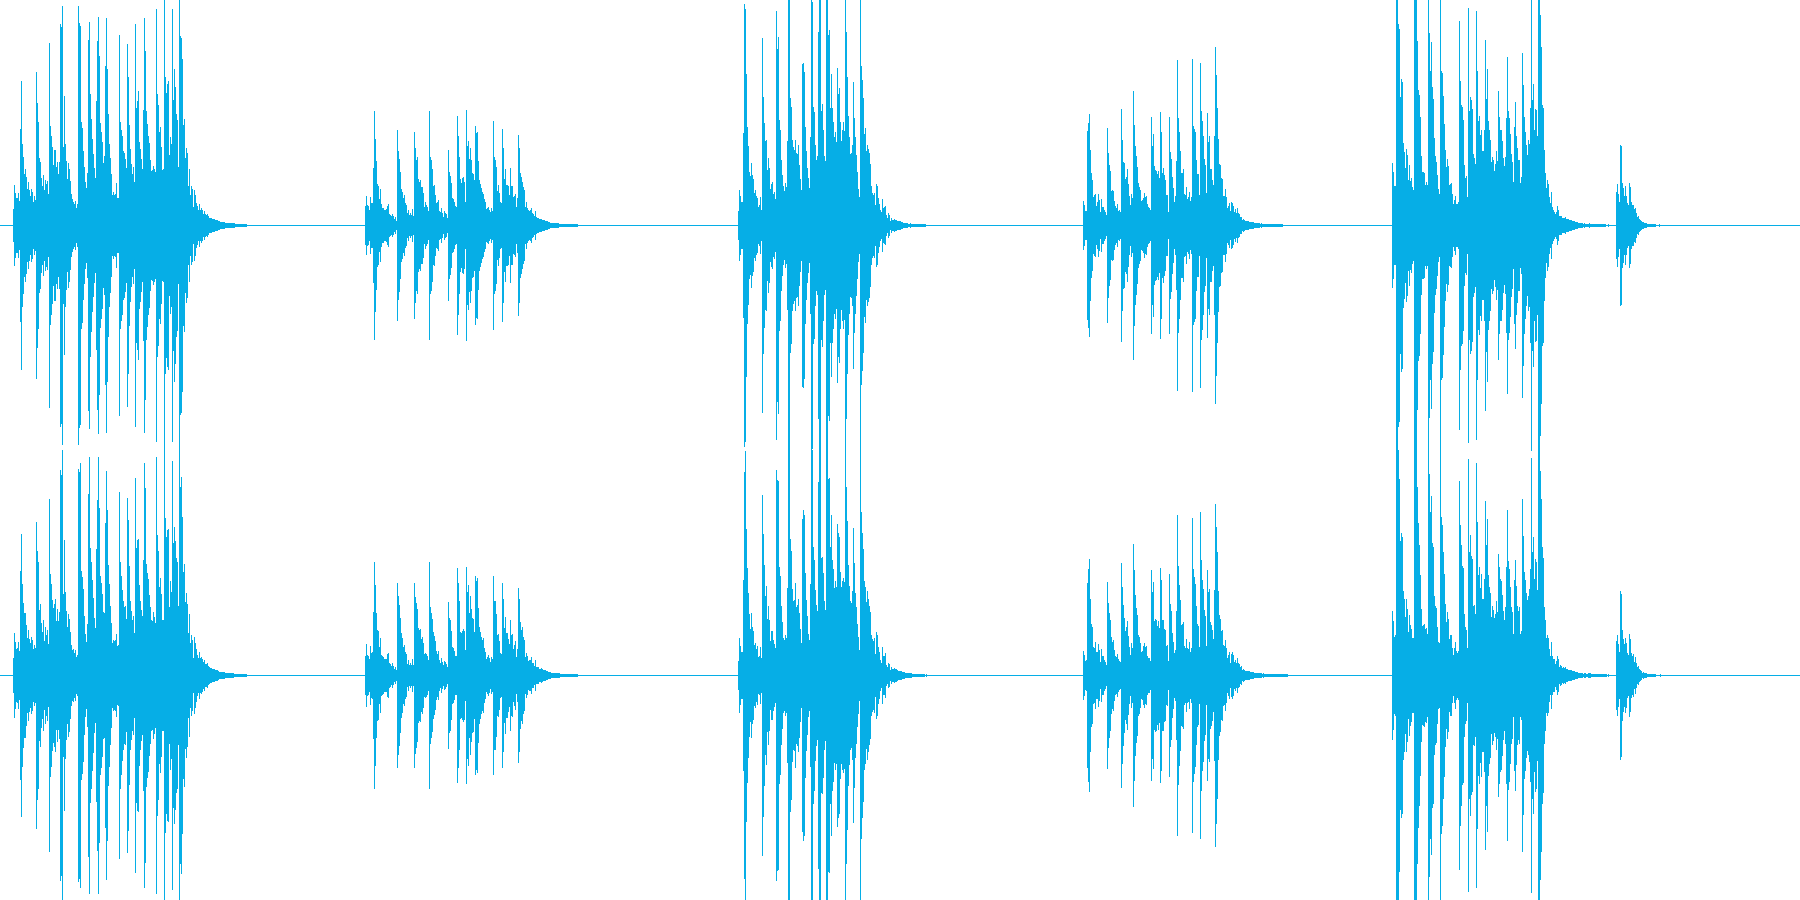 大太鼓7風音歌舞伎情景描写和風和太鼓ホラの再生済みの波形